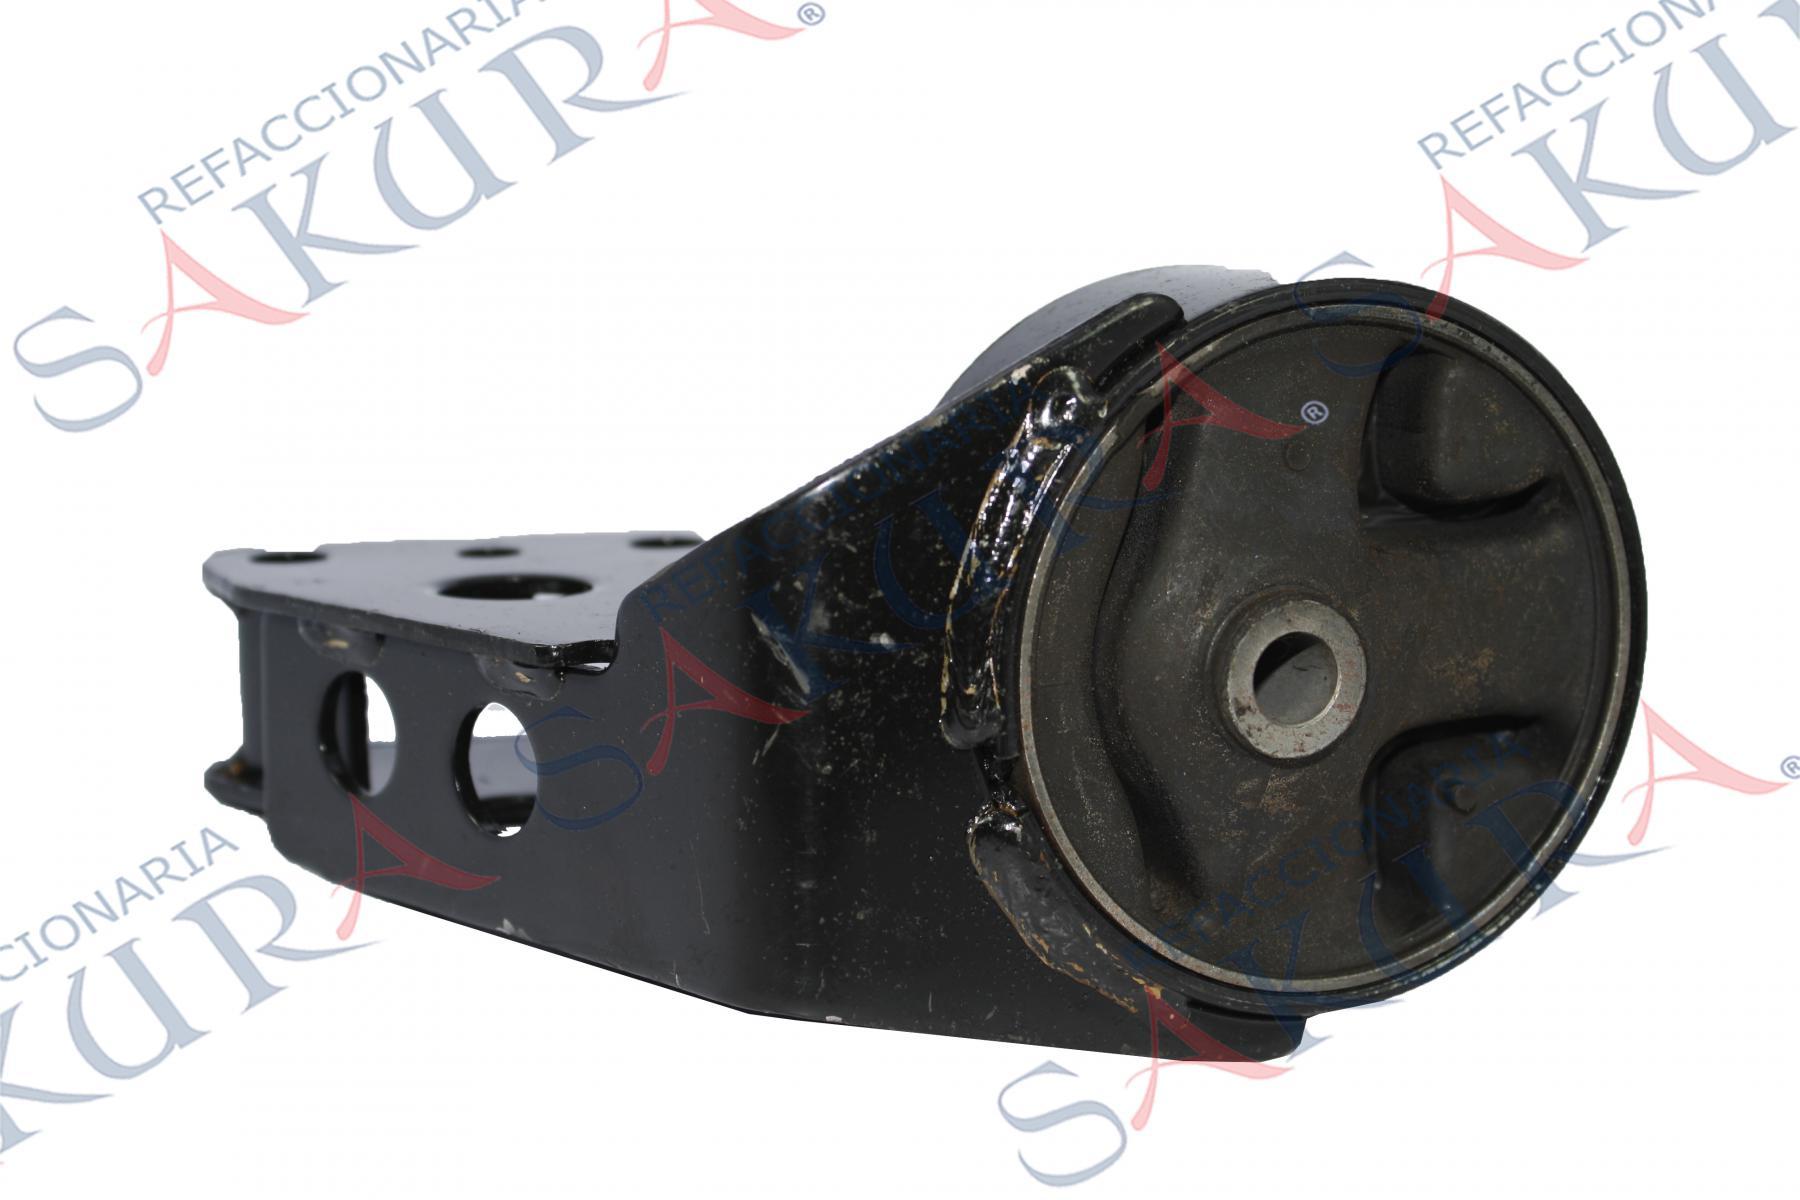 112204B010, Soporte Caja Velocidades  (Nissan)